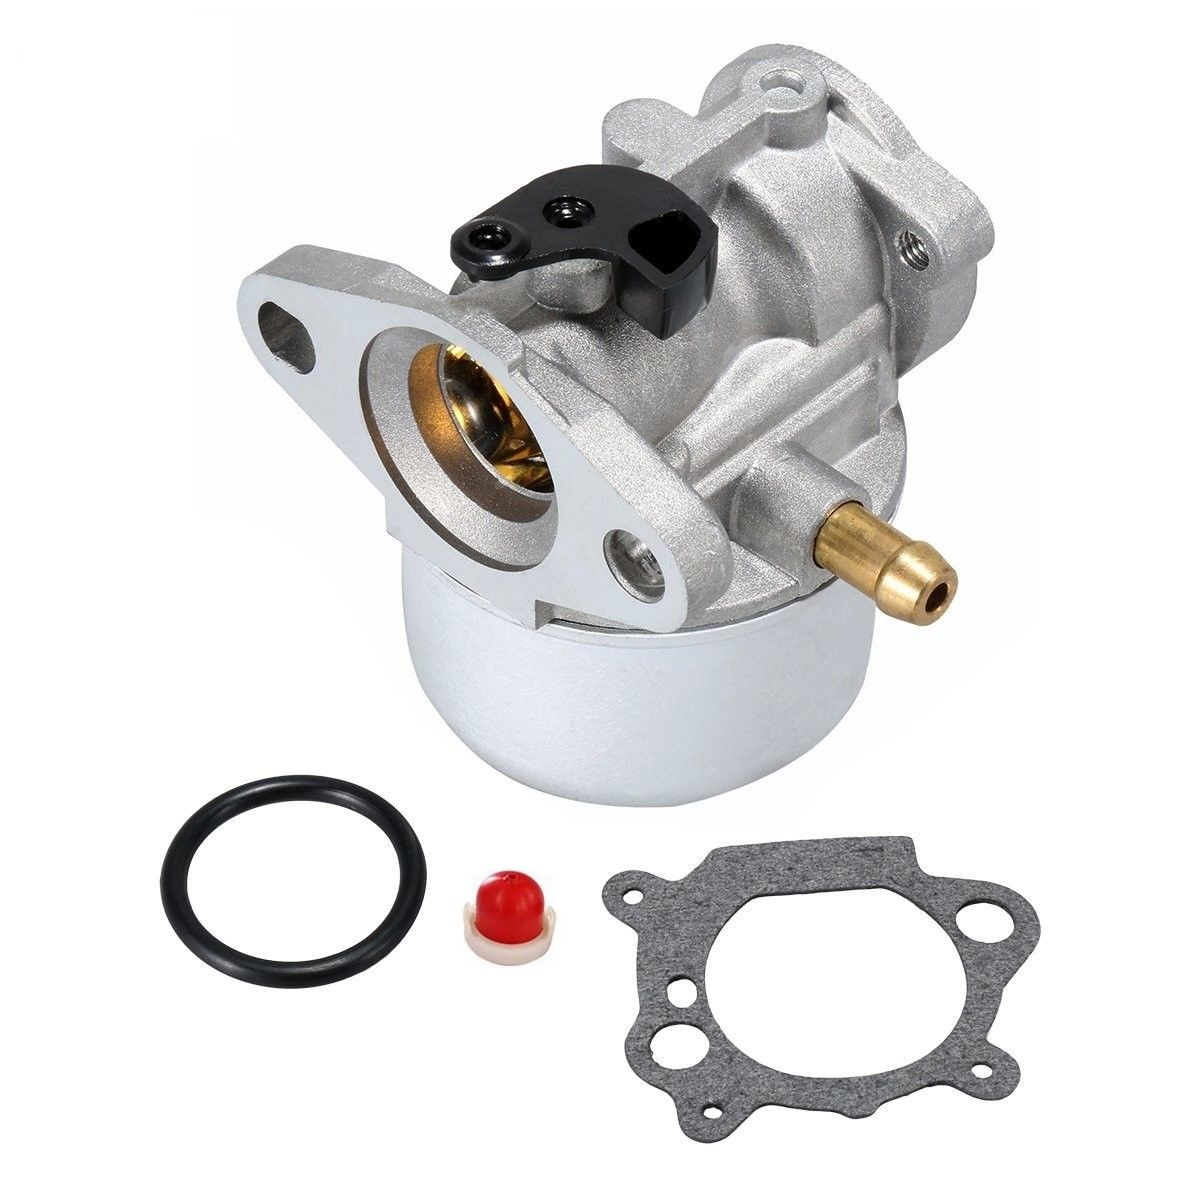 Carburetor For BRIGGS & STRATTON 799868 498254 497347 497314 498170 Carb (Standard Shipping)